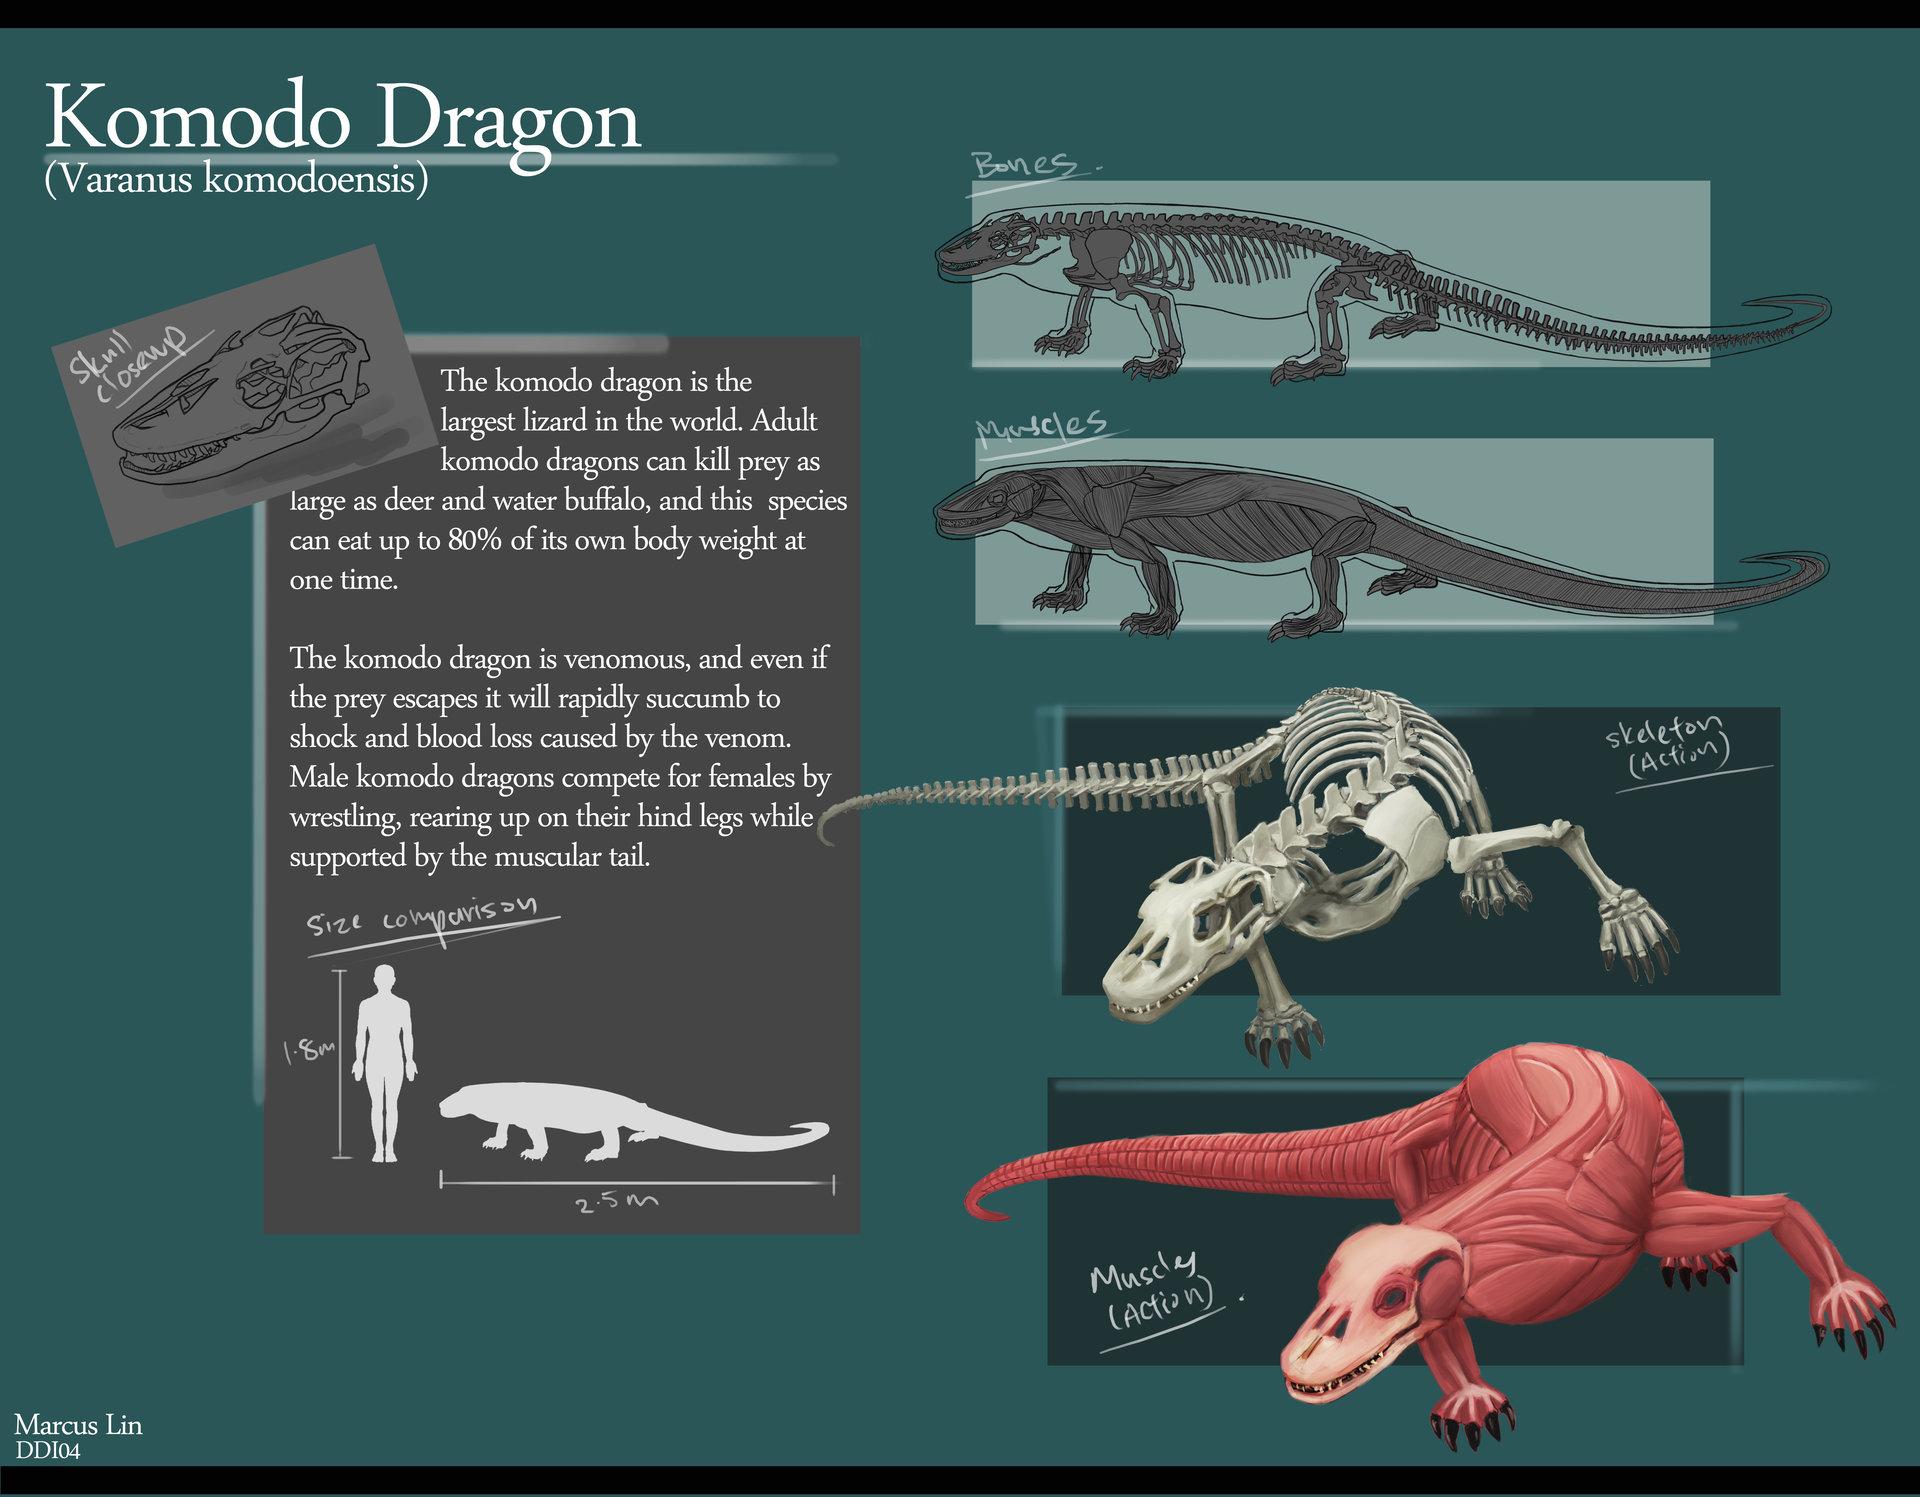 Marcus Lin - Komodo Dragon Anatomy Studies